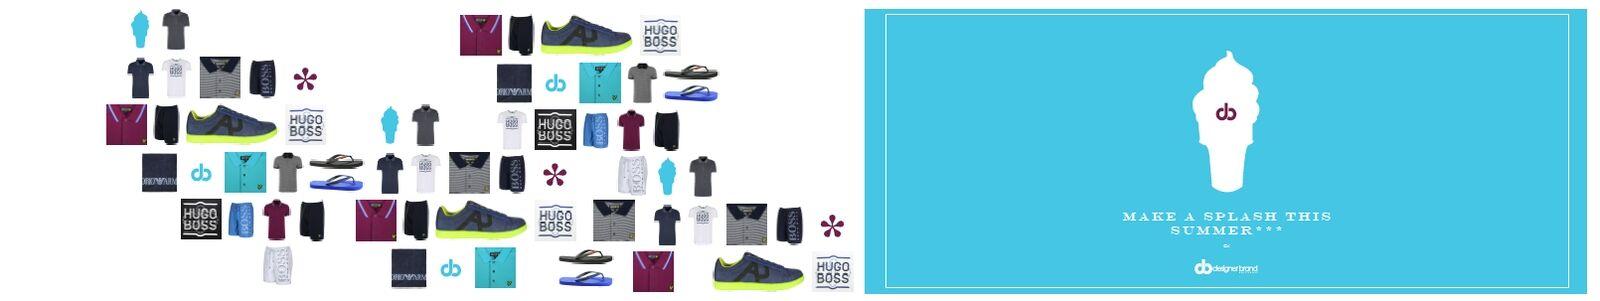 DBNW Ltd - Designer Clothing